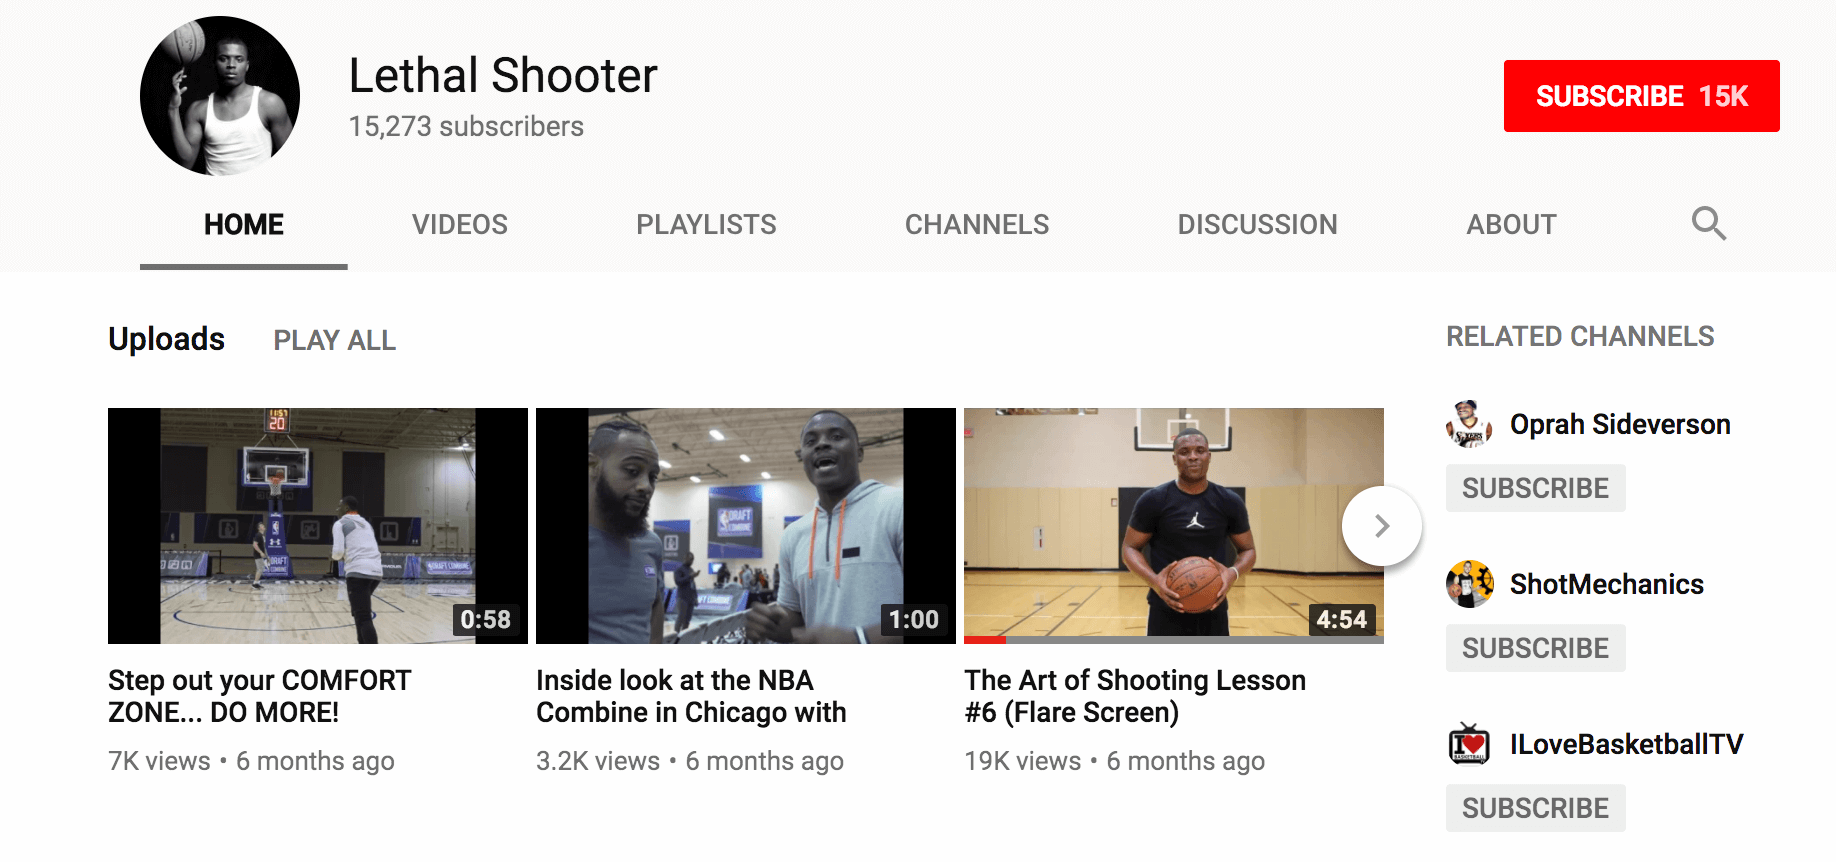 Screenshot showing Lethal Shooter